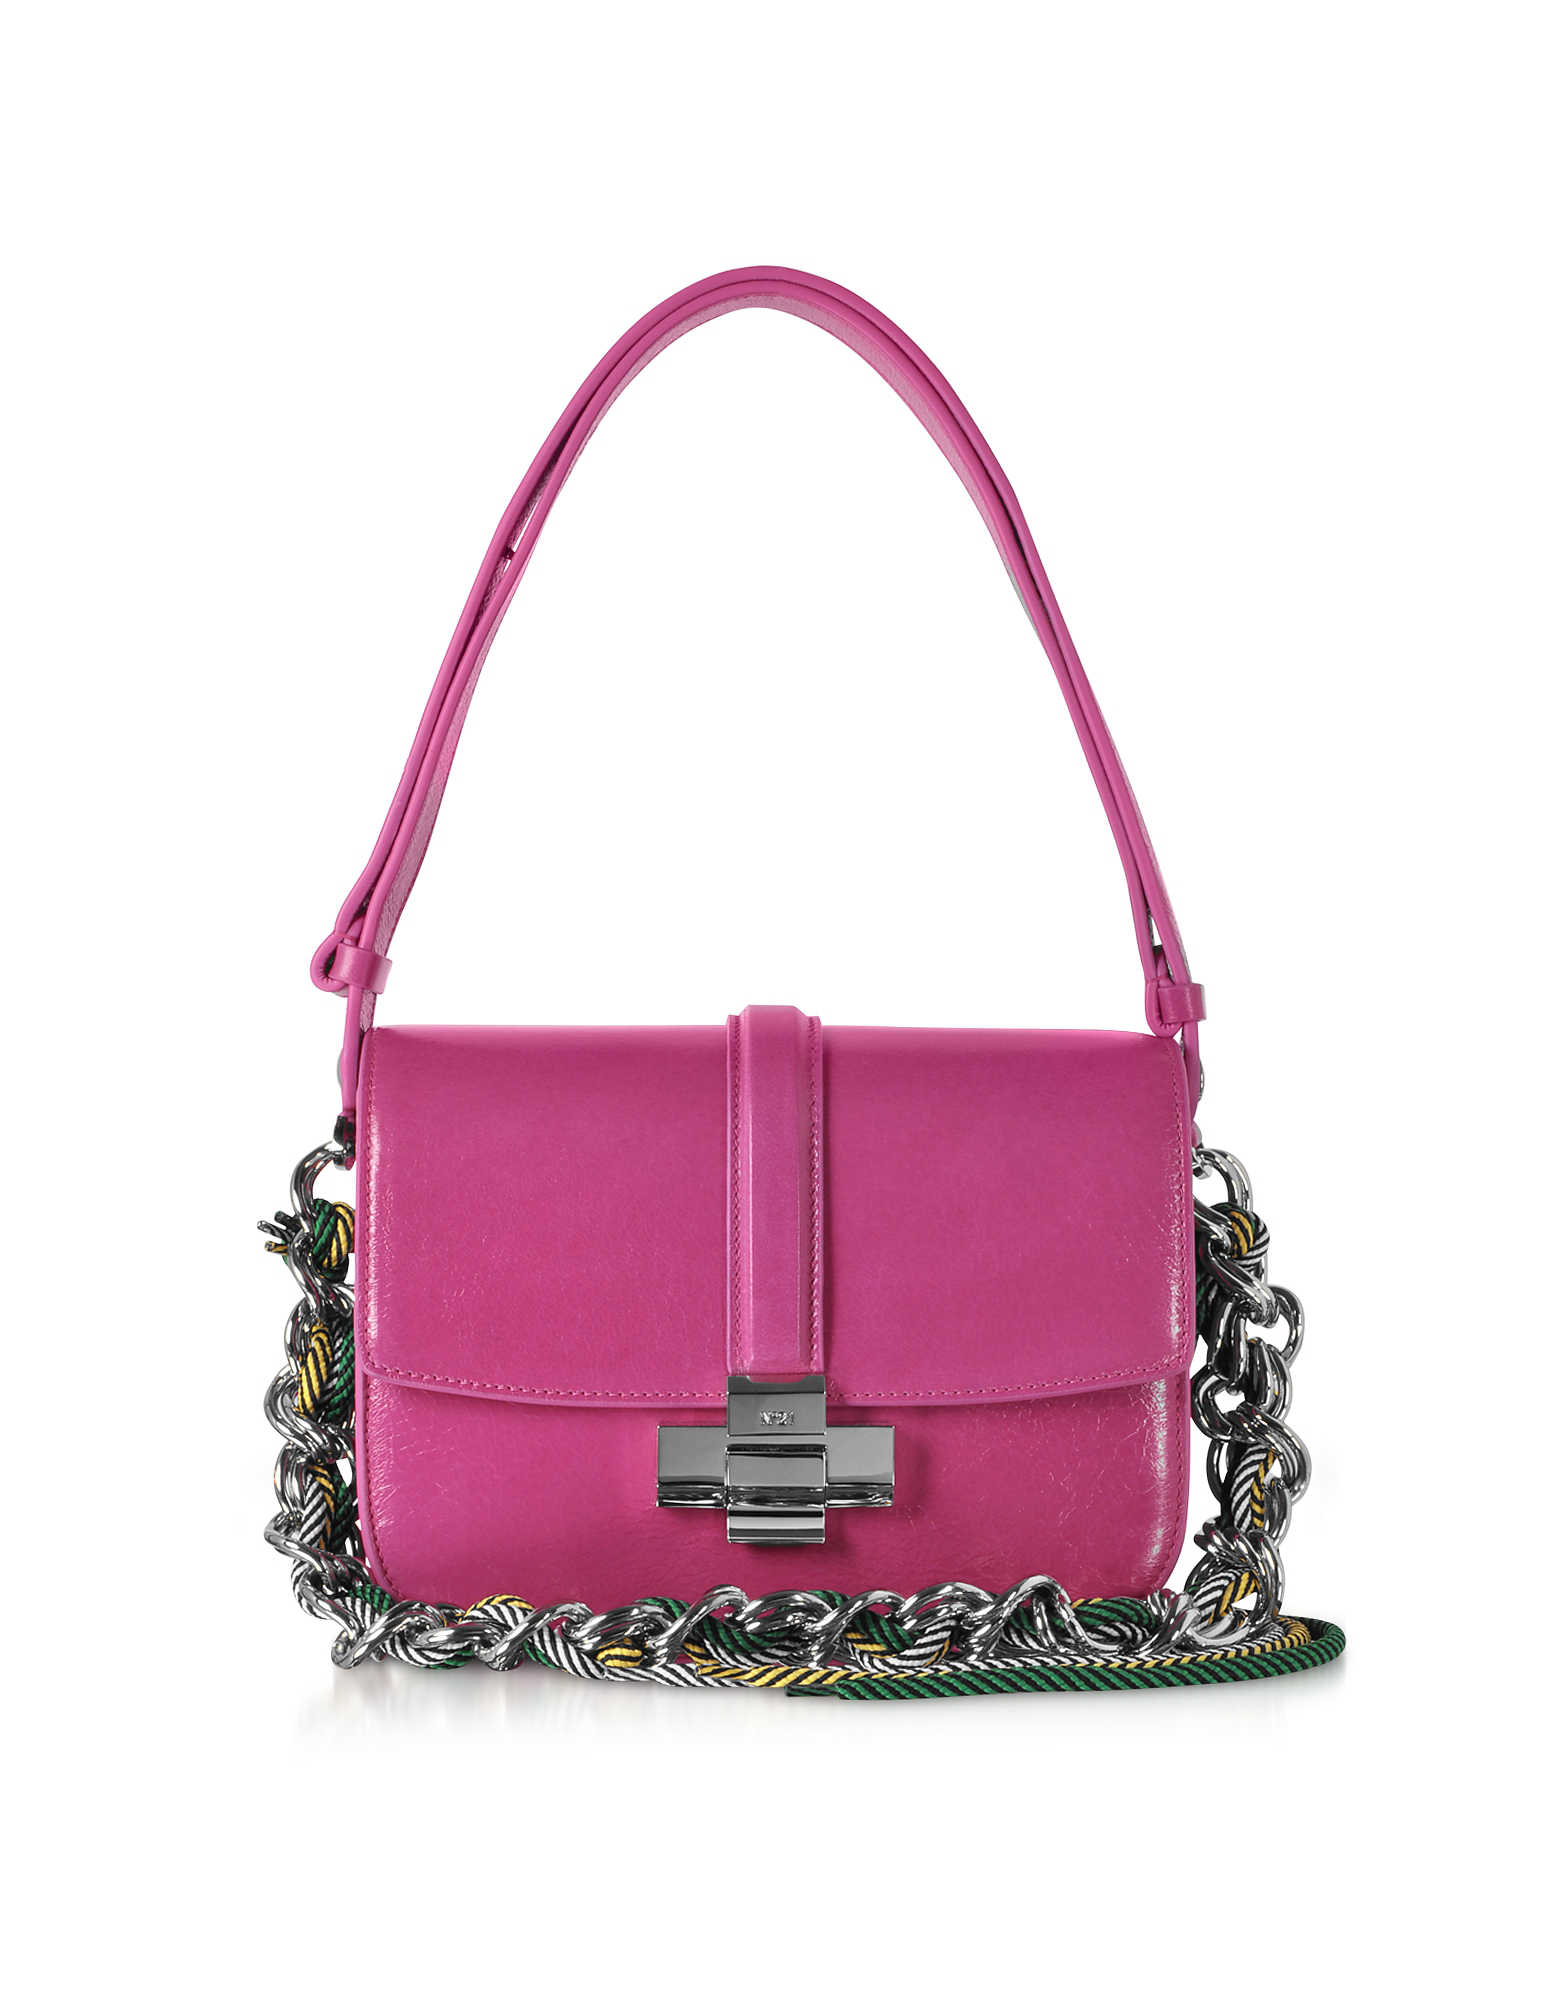 N°21 Fuchsia Leather Lolita Bag